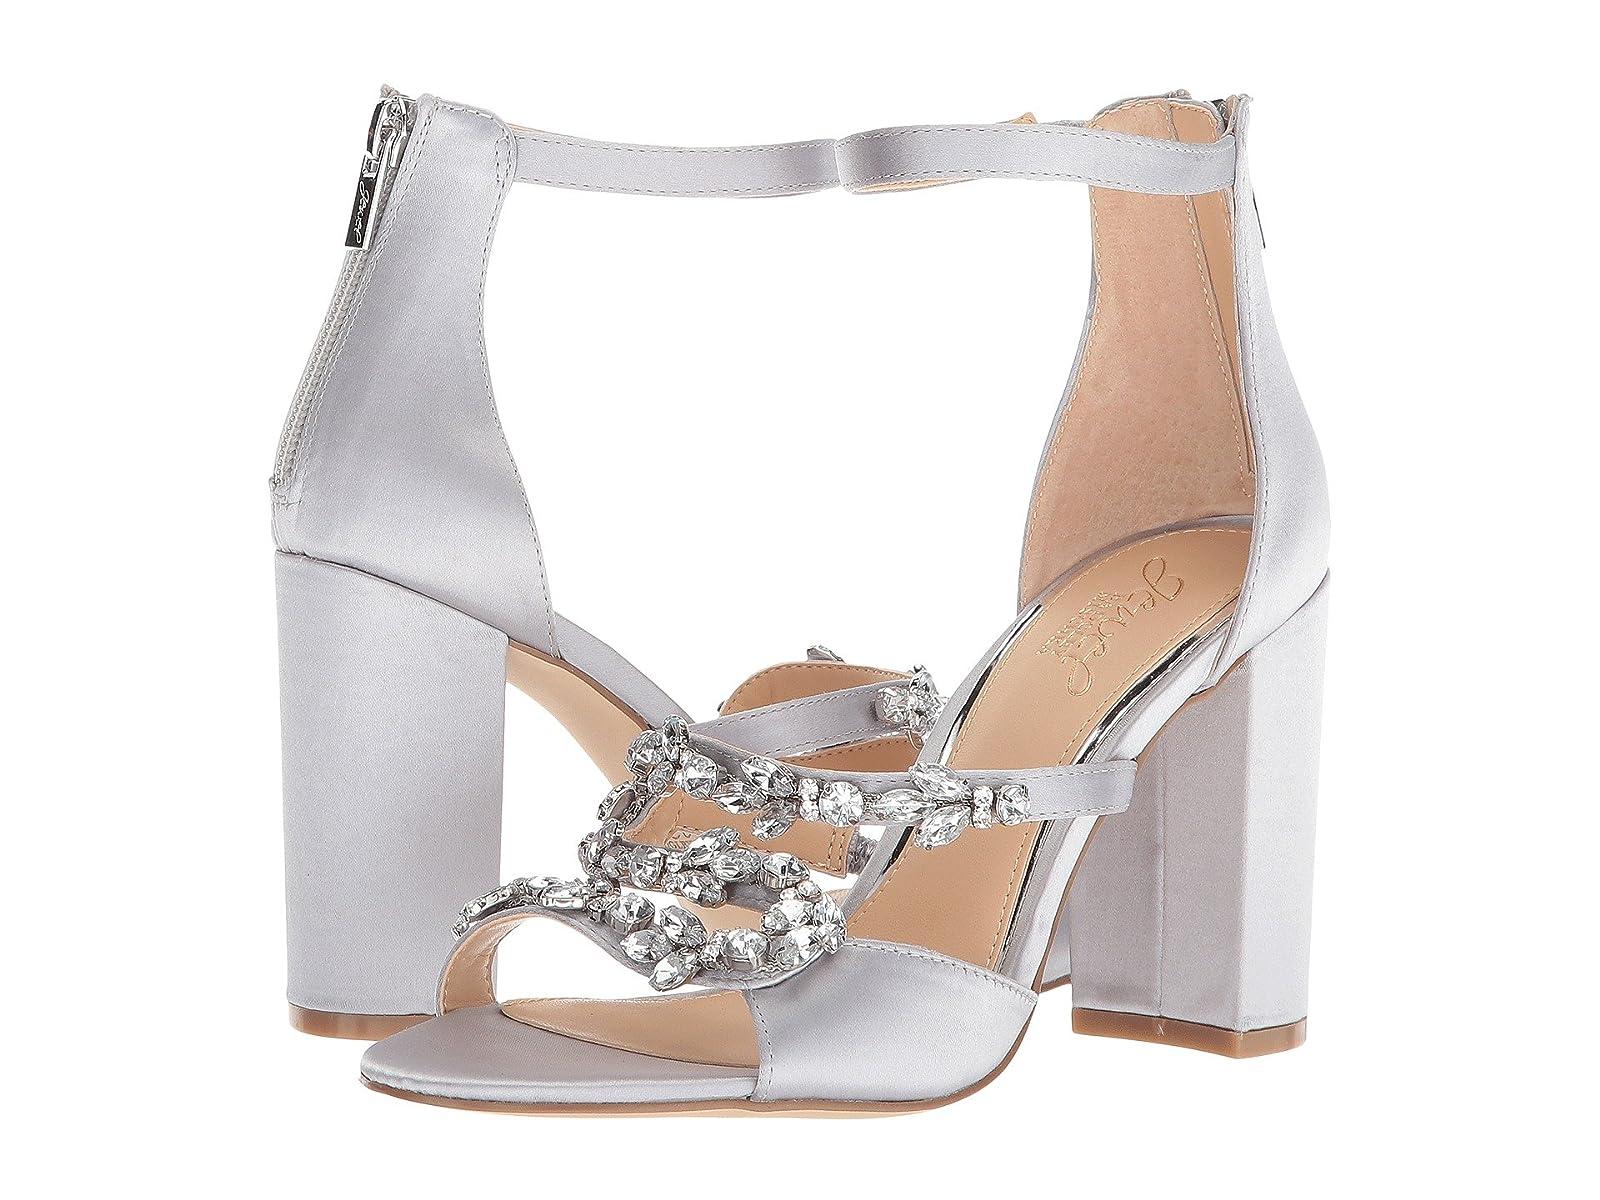 Jewel Badgley Mischka GaniceCheap and distinctive eye-catching shoes